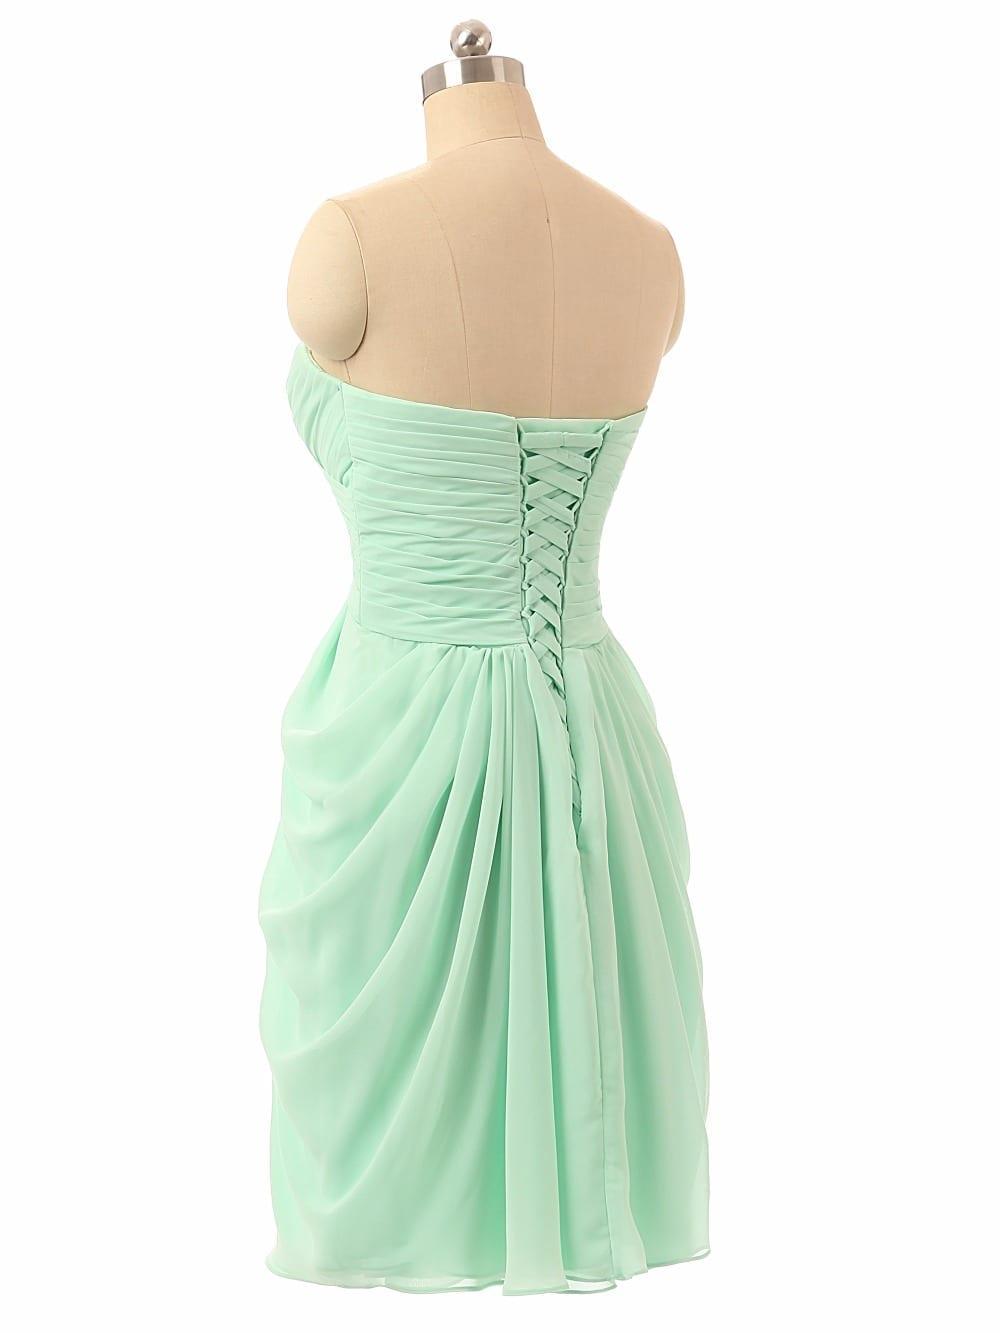 Sweetheart Chiffon Beach Mint Green Bridesmaid Dress